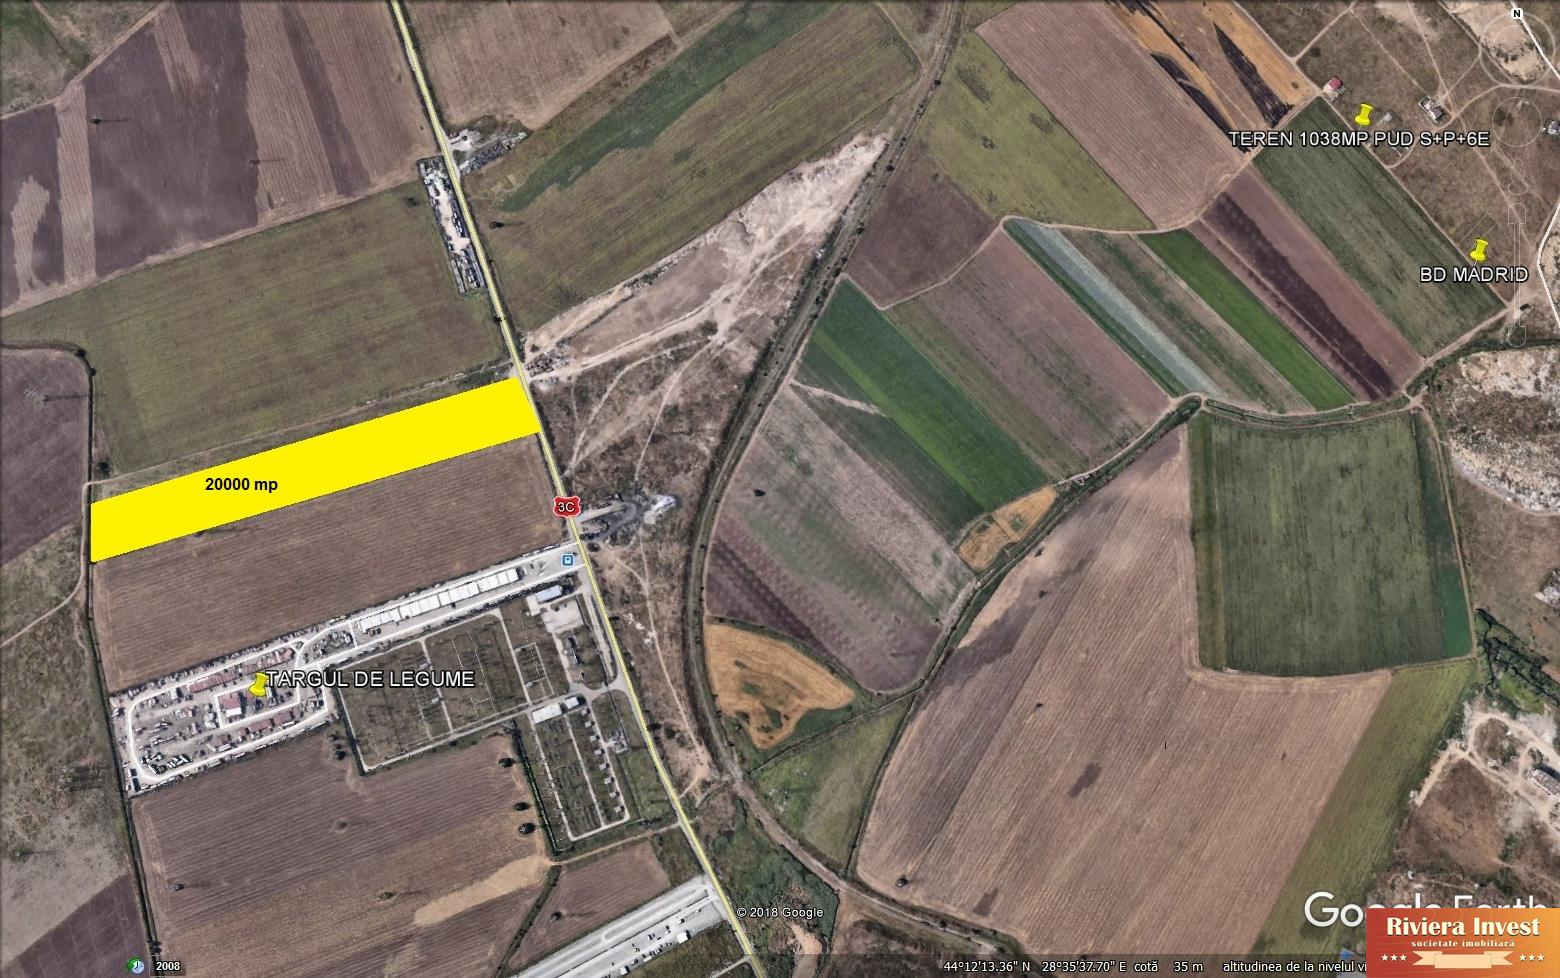 Varianta Ovidiu targul de legume ,teren 20000 mp, ideal investitie